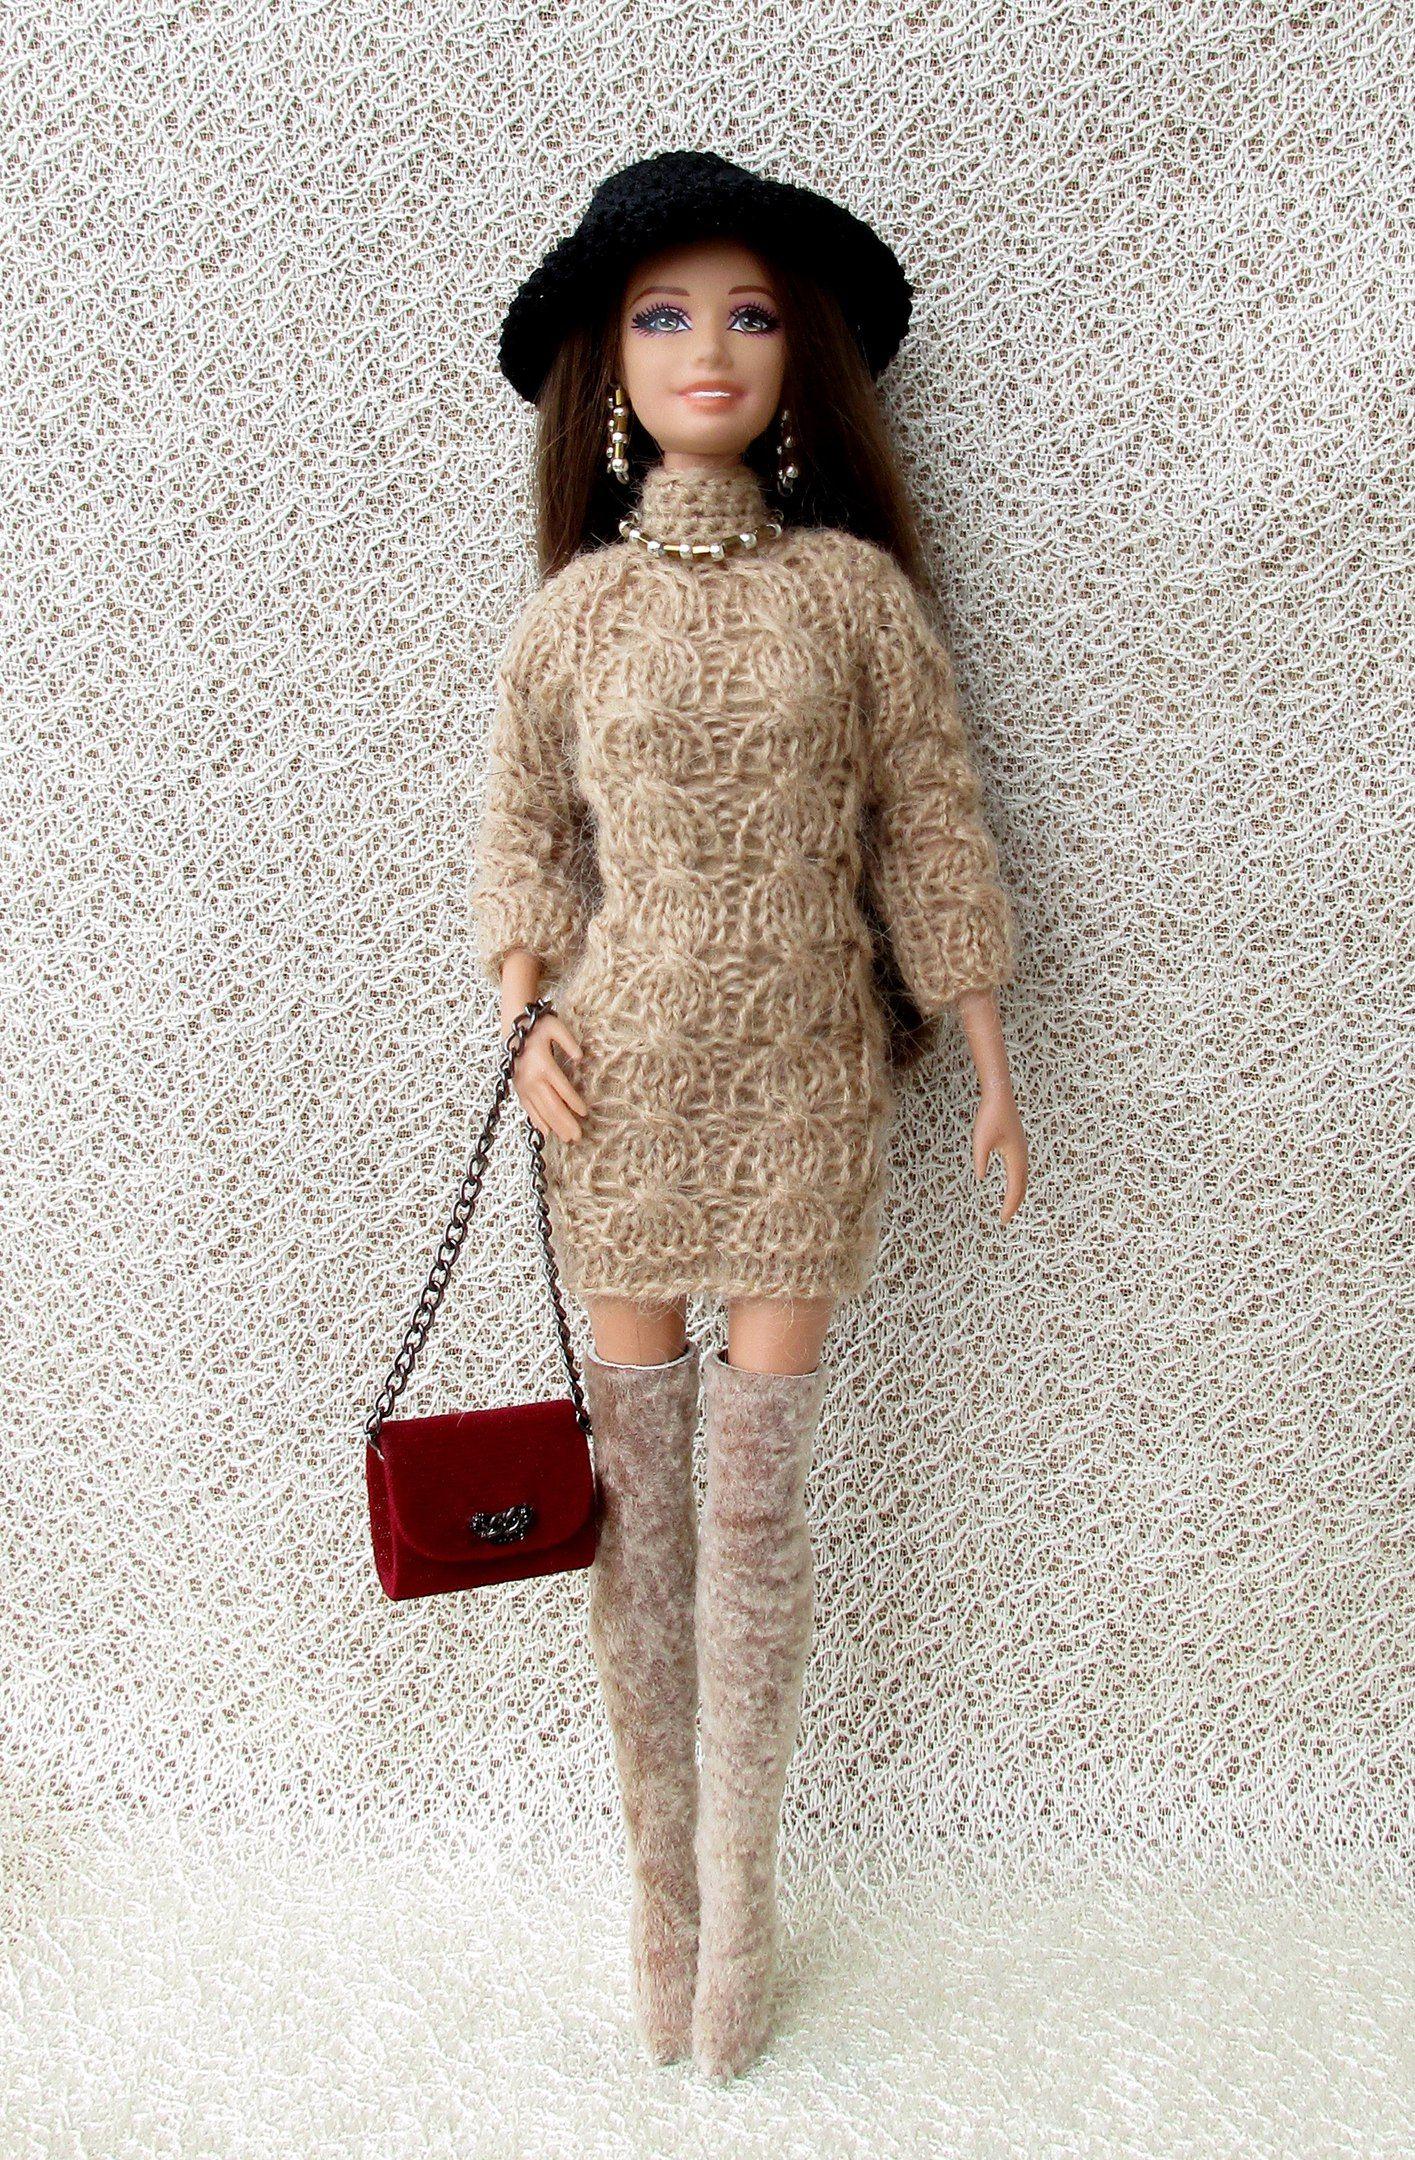 Svetlana Top – 163 photos | VK | Barbies and other Dolls | Pinterest